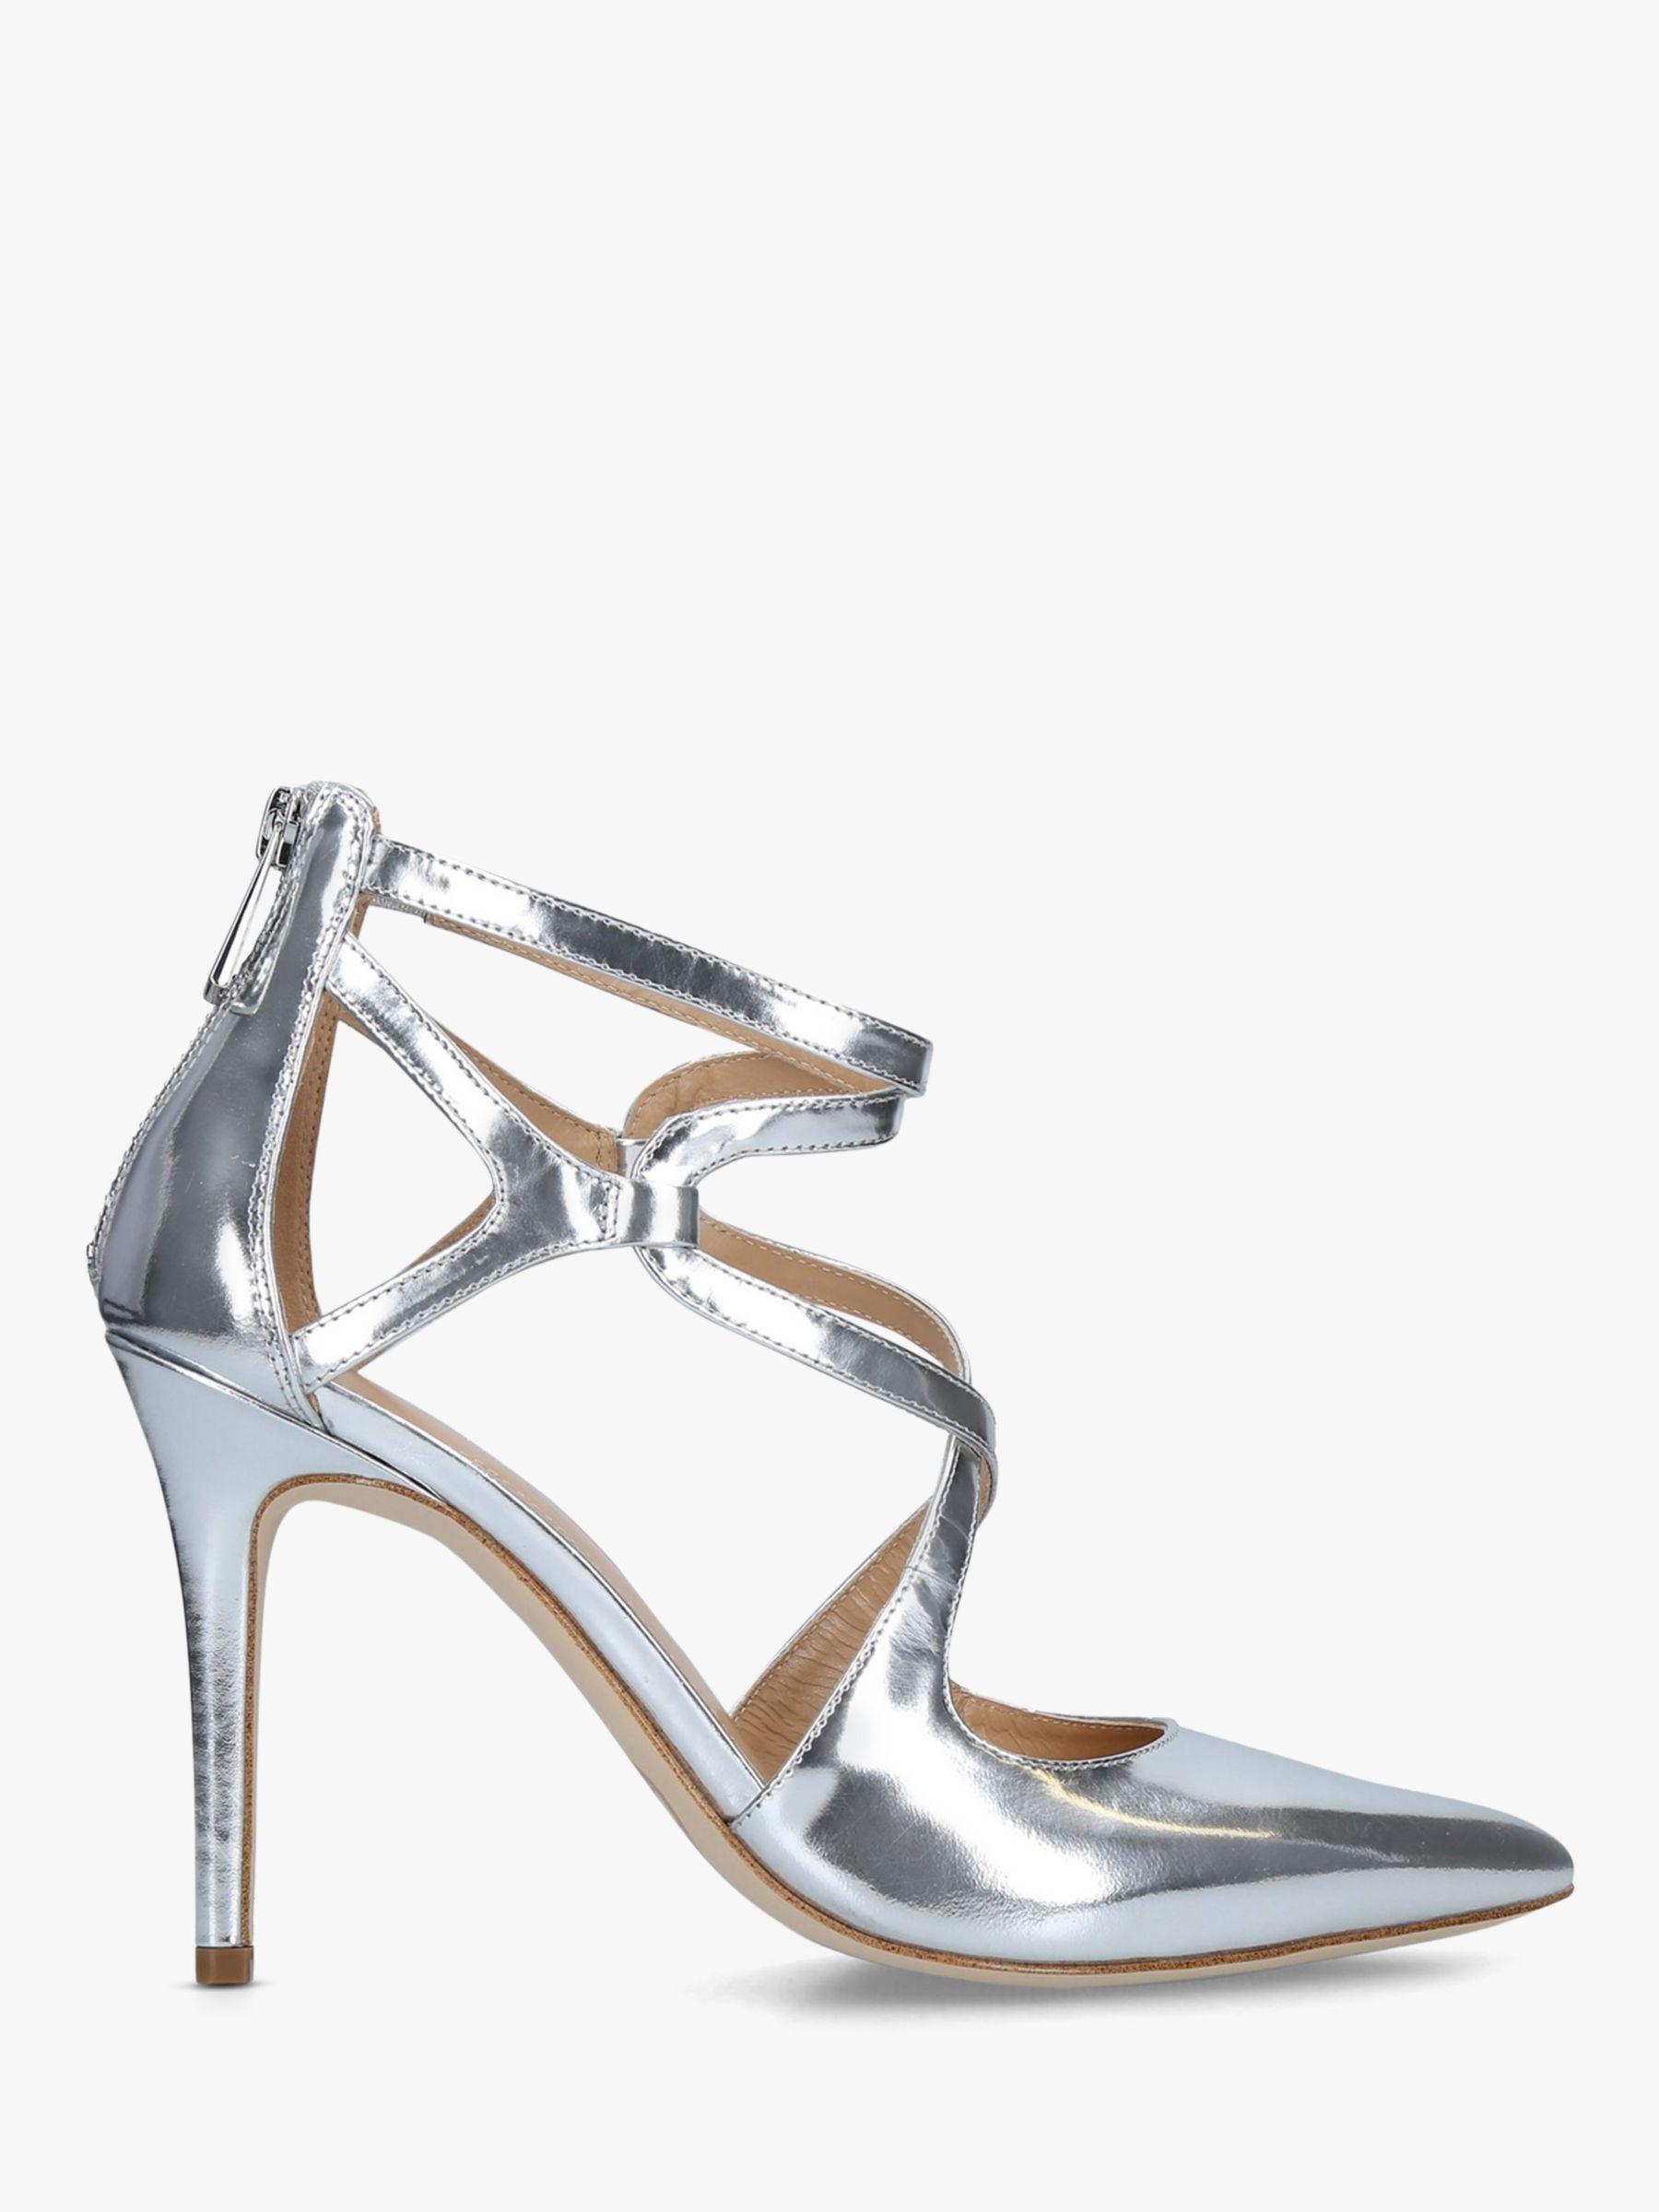 a11104e66cb Michael Kors Michael Catia Stiletto Court Shoes in Metallic - Lyst